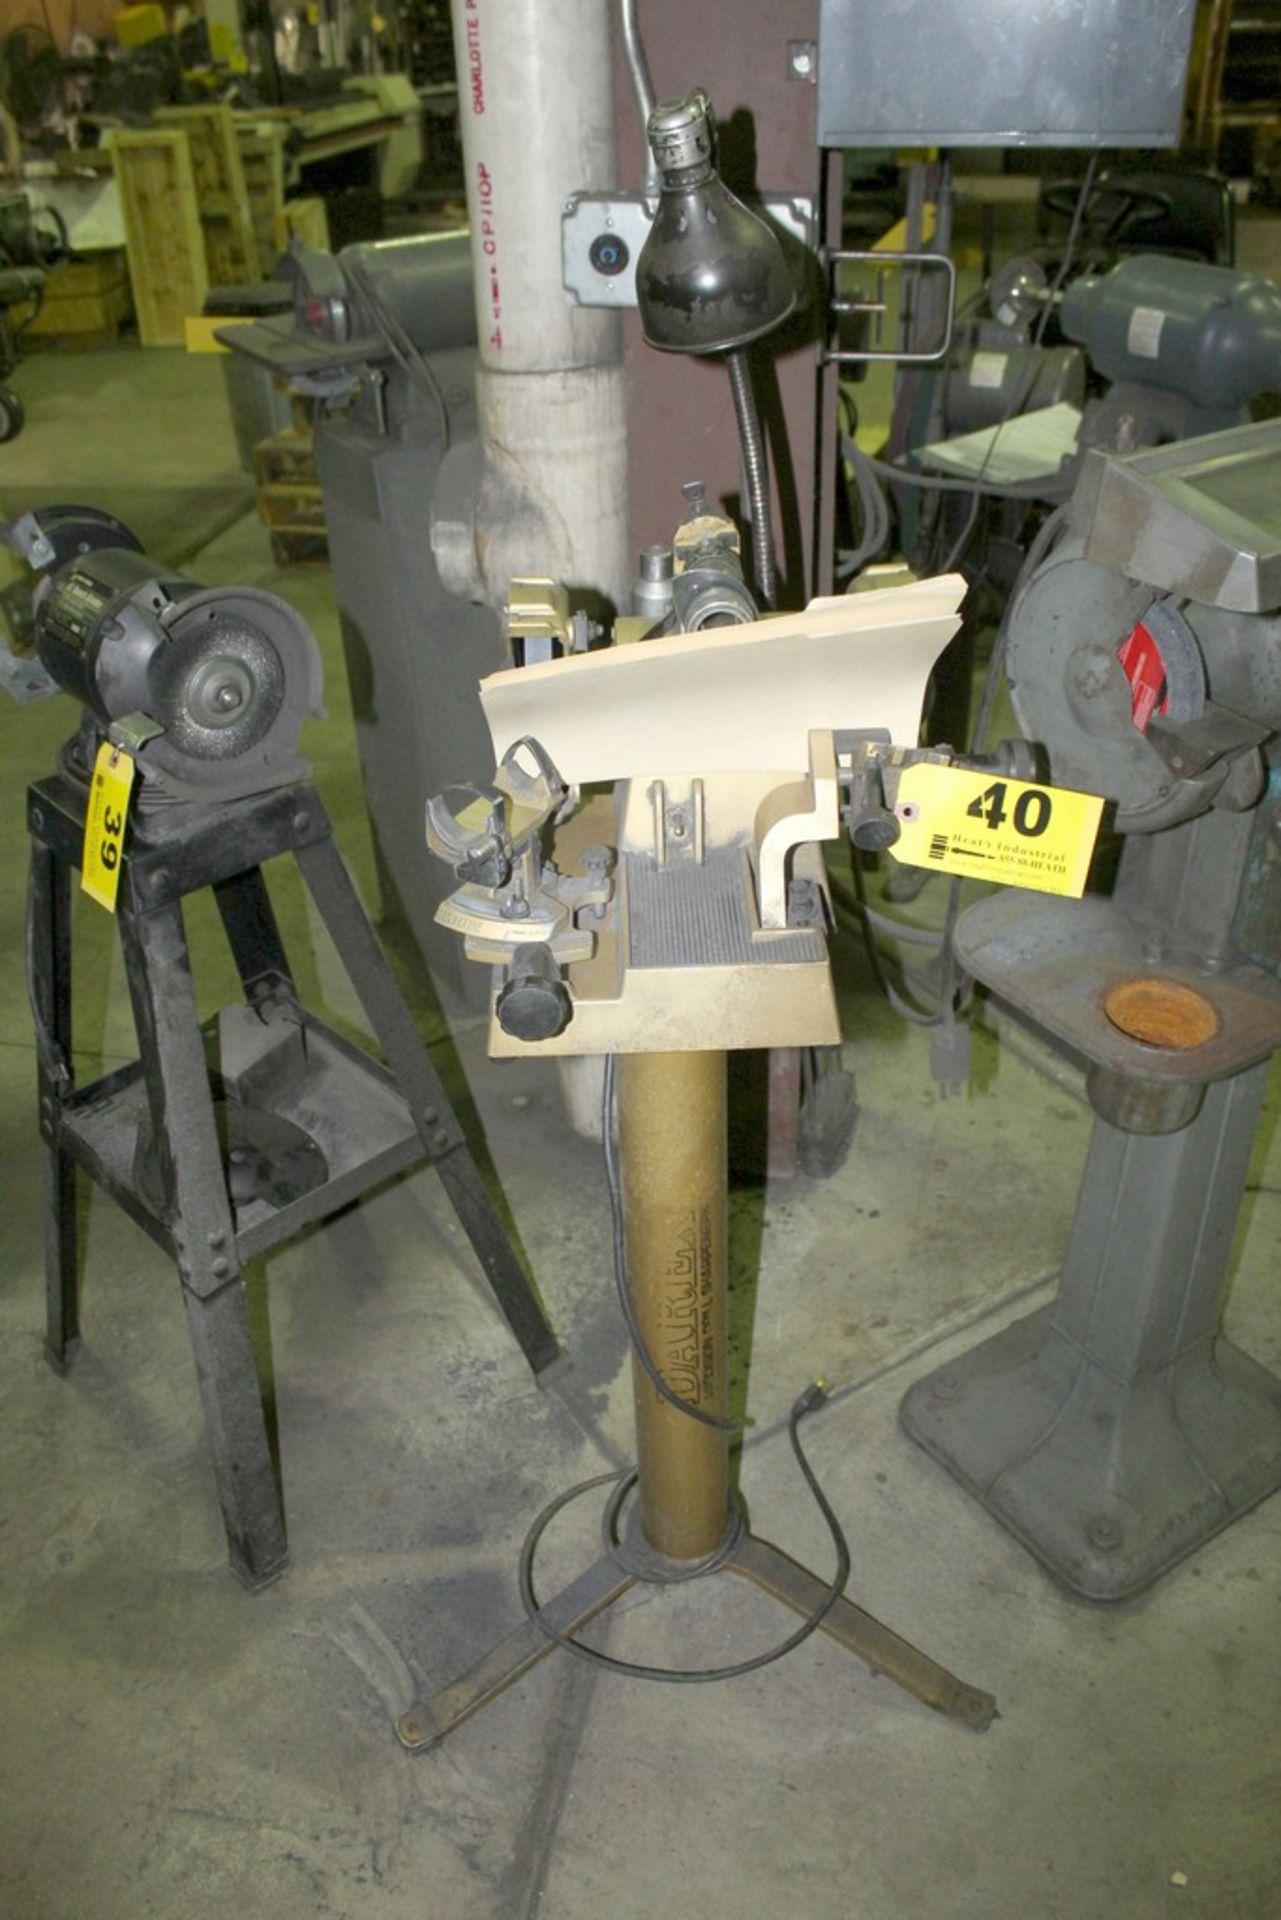 Lot 40 - DAREX M4/5 PRECISION DRILL SHARPENER S/N 52472 ON DAREX STAND